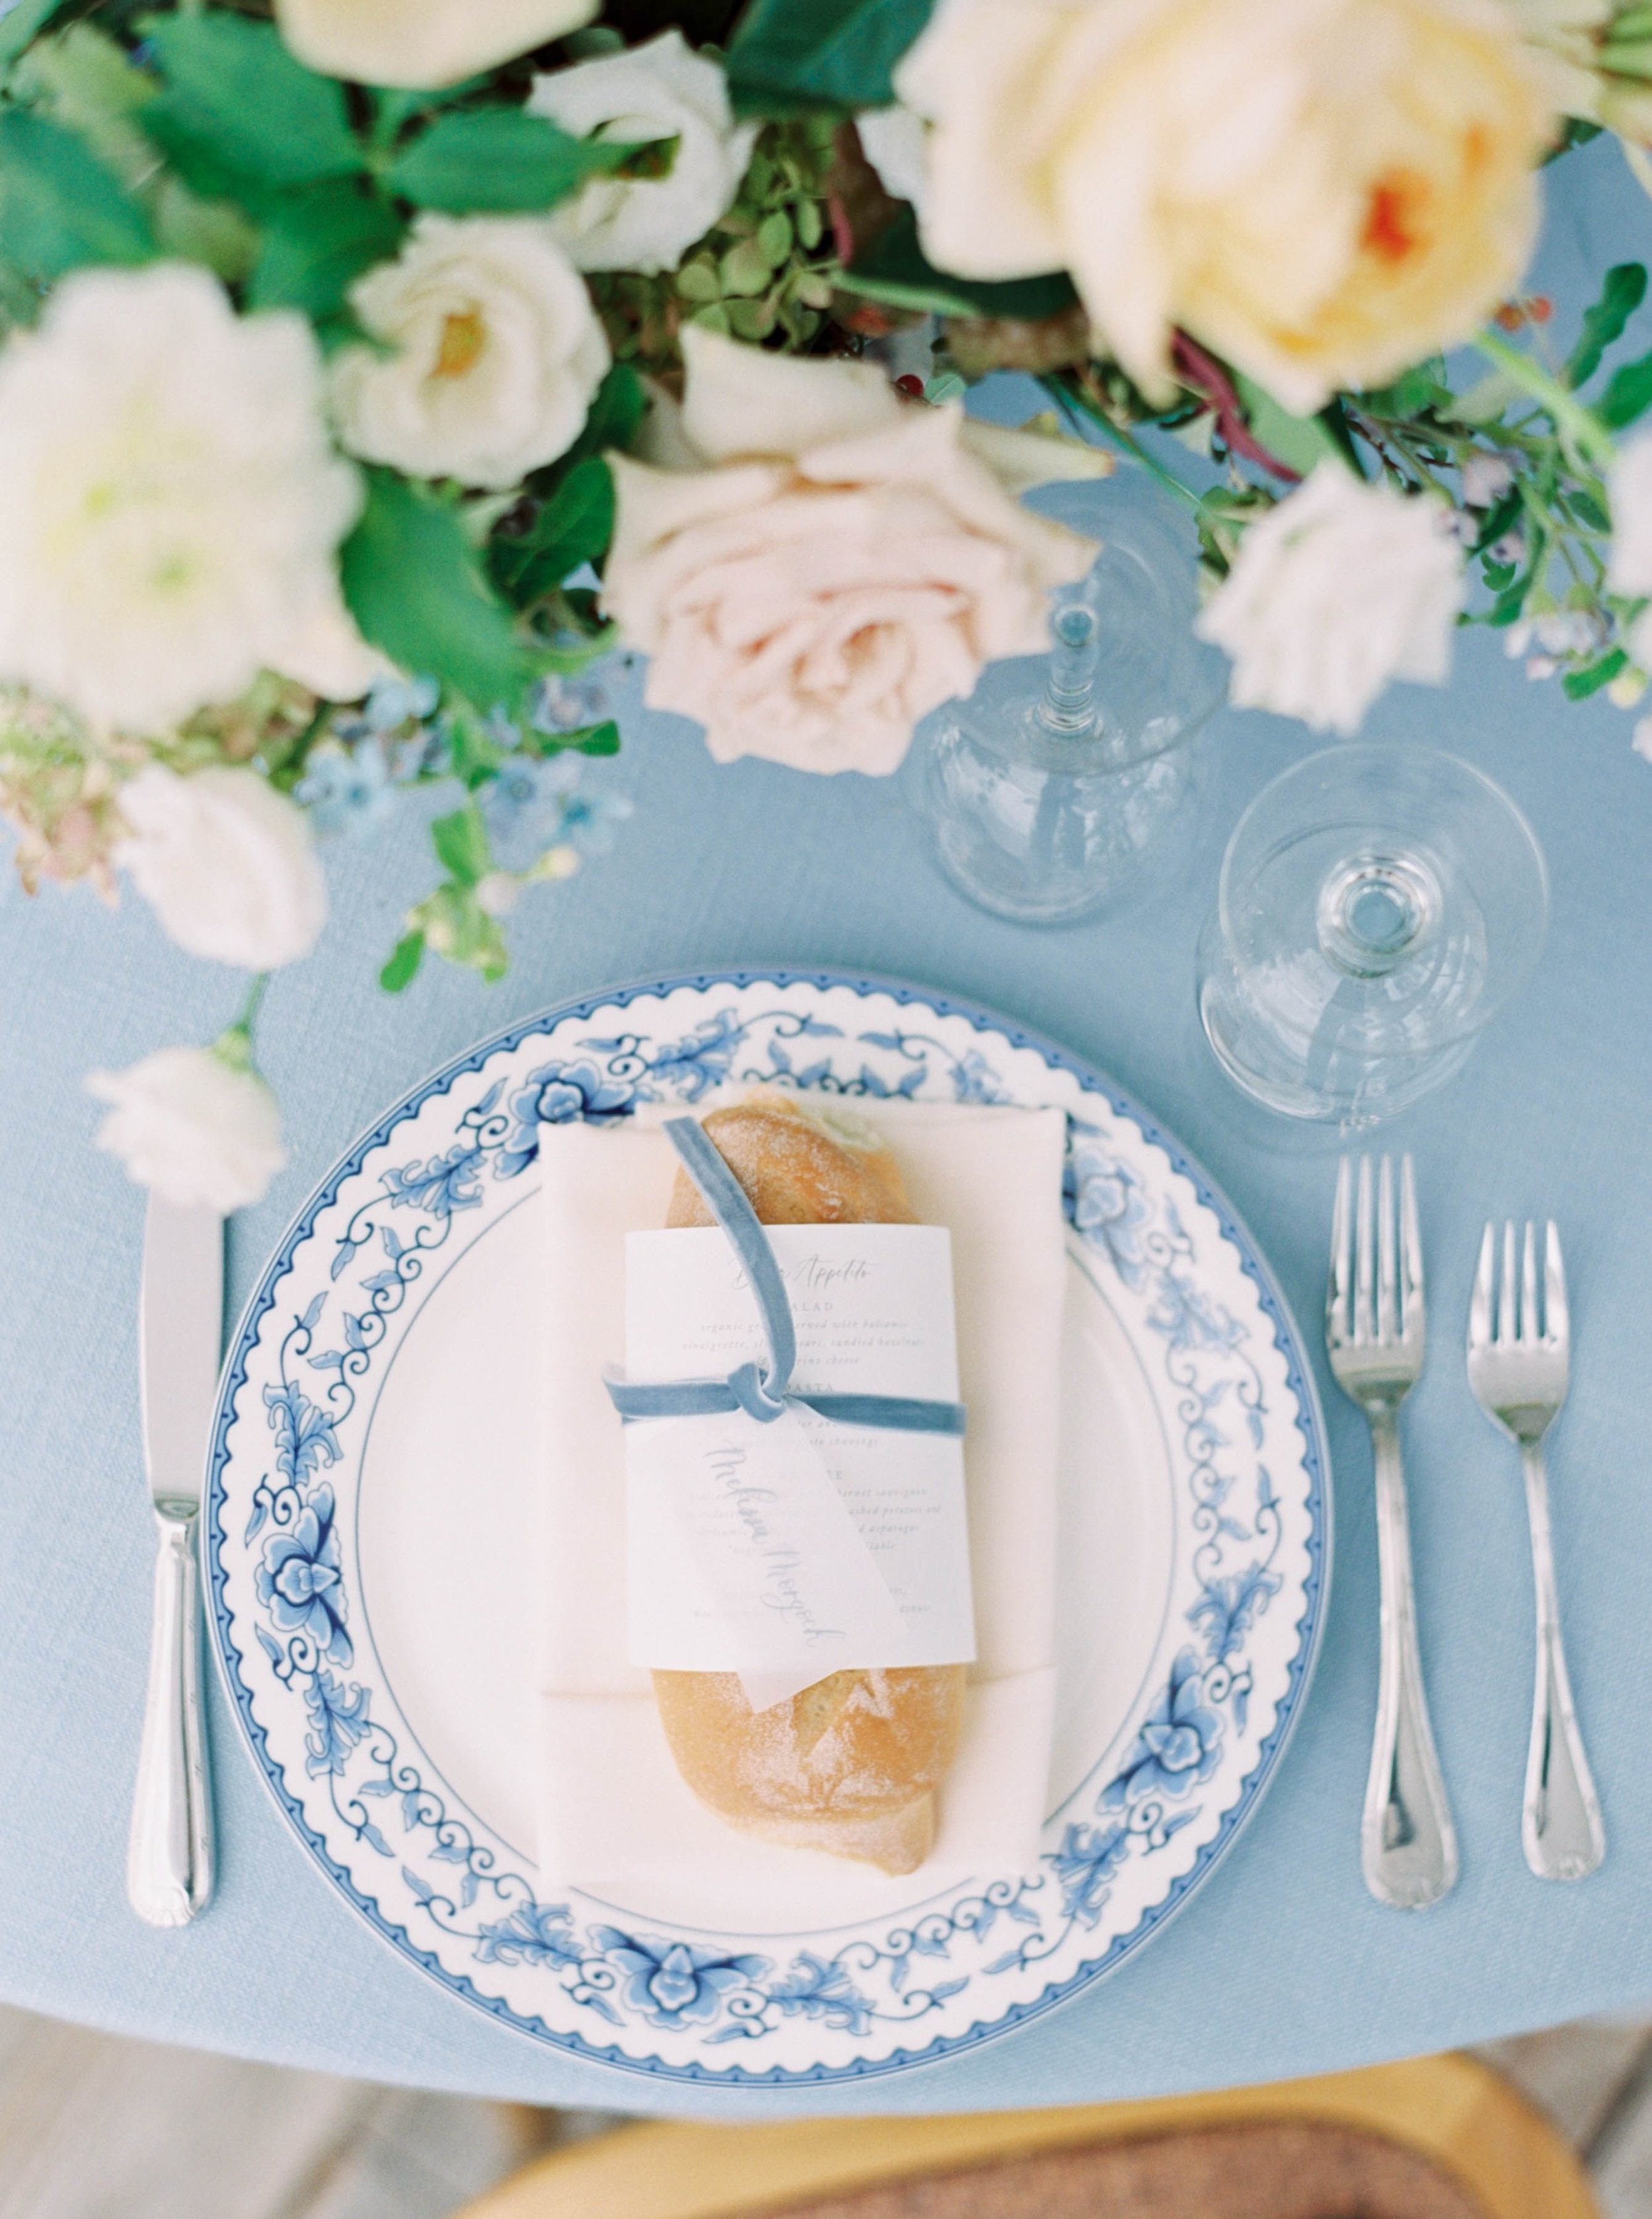 kurtz-gracewood-wedding-soft-airy-photographer-white-book-danielle-carmen-8.jpg